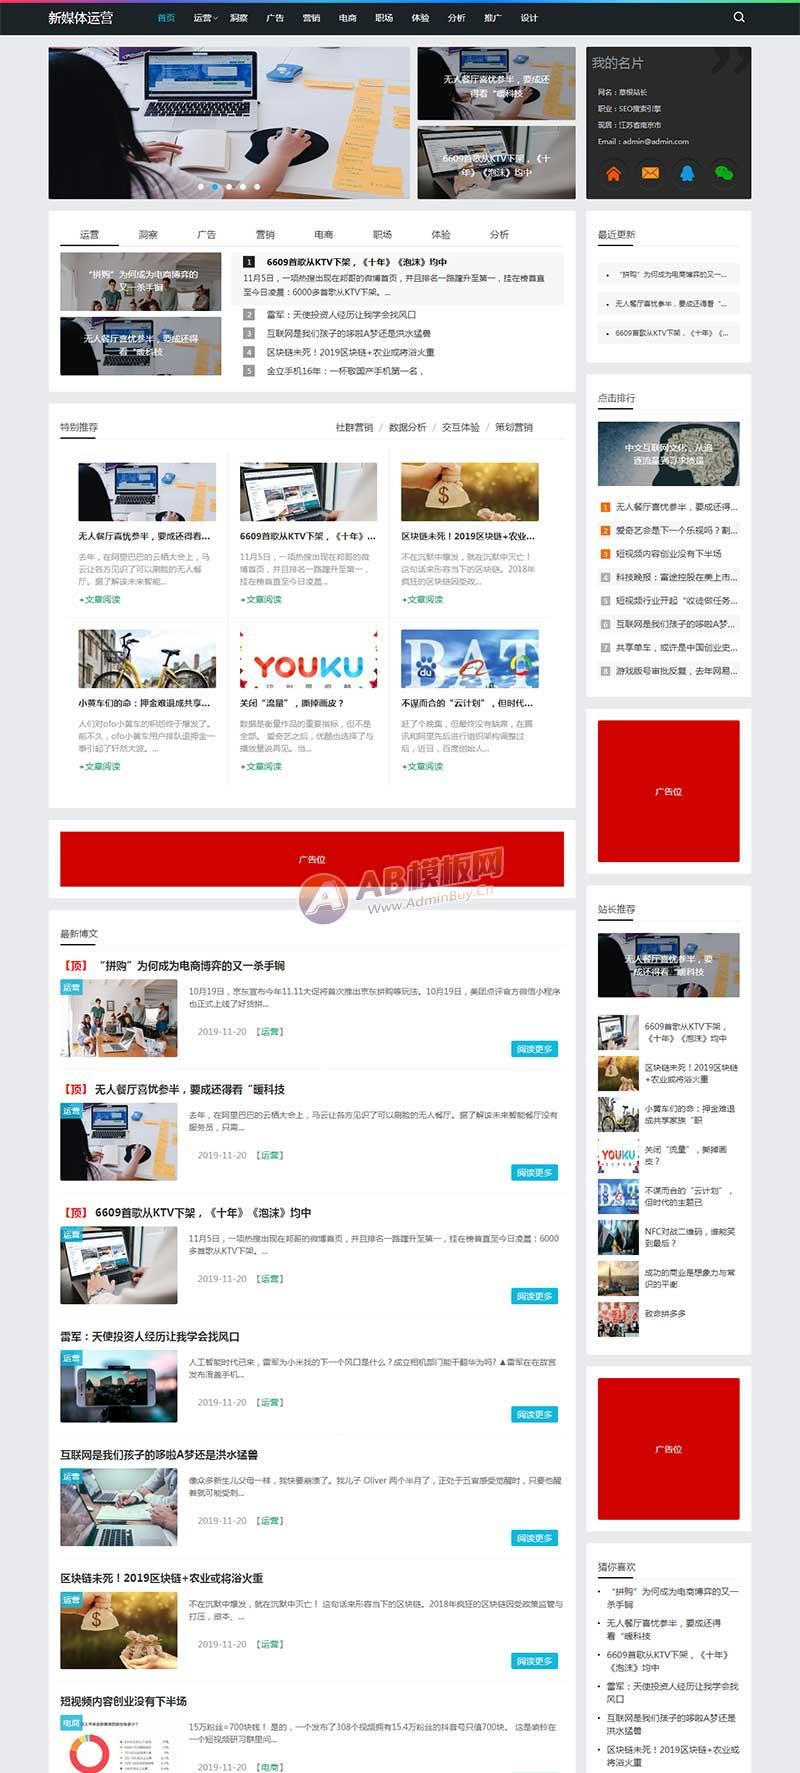 HTML5新媒体运营资讯类网站织梦模板 响应式科技互联网新闻资讯[织梦内核]